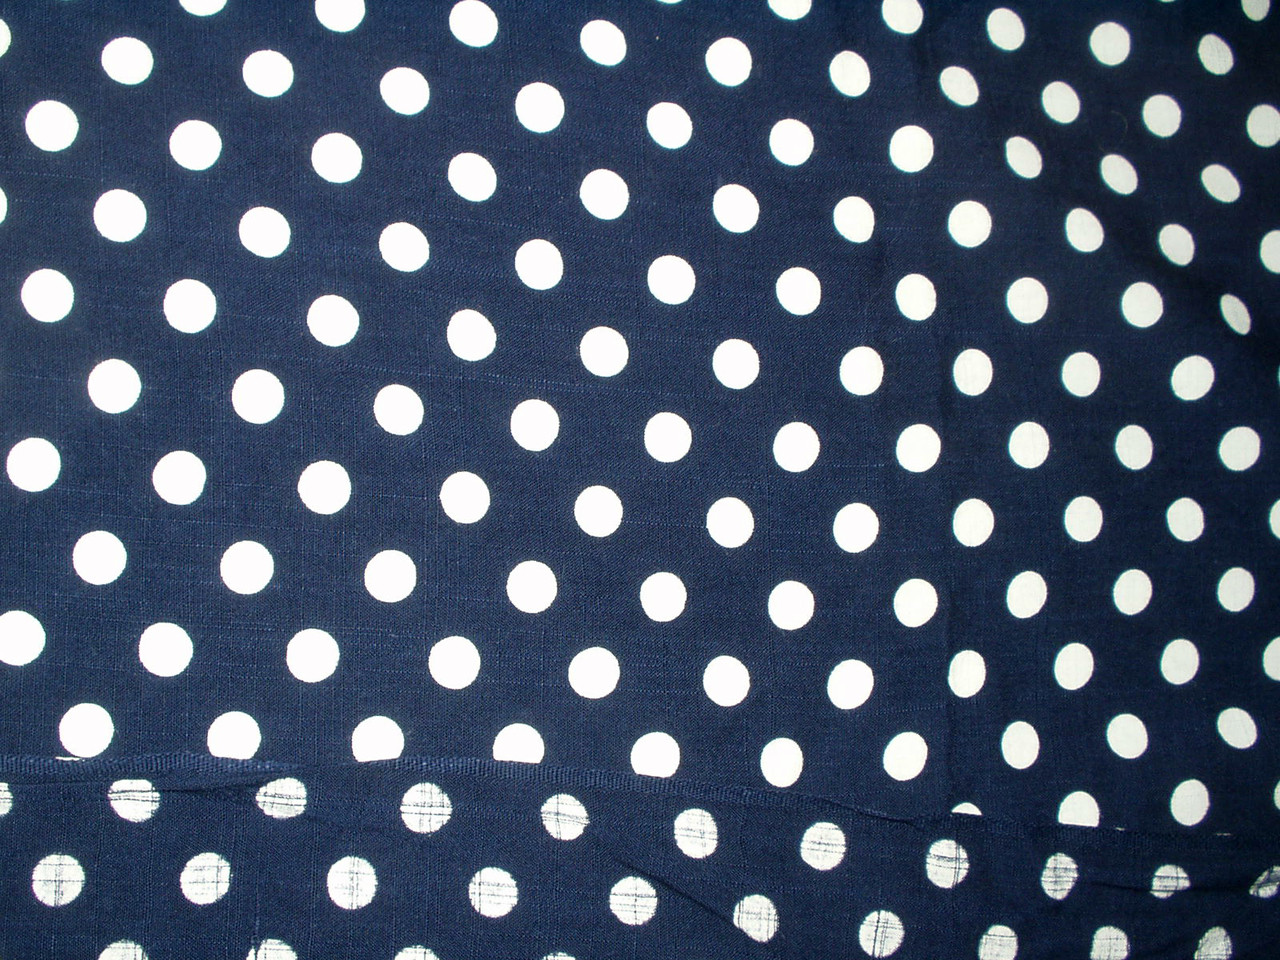 1950 Vintage Polka Dot Fabric Cotton Navy Dress Yardage